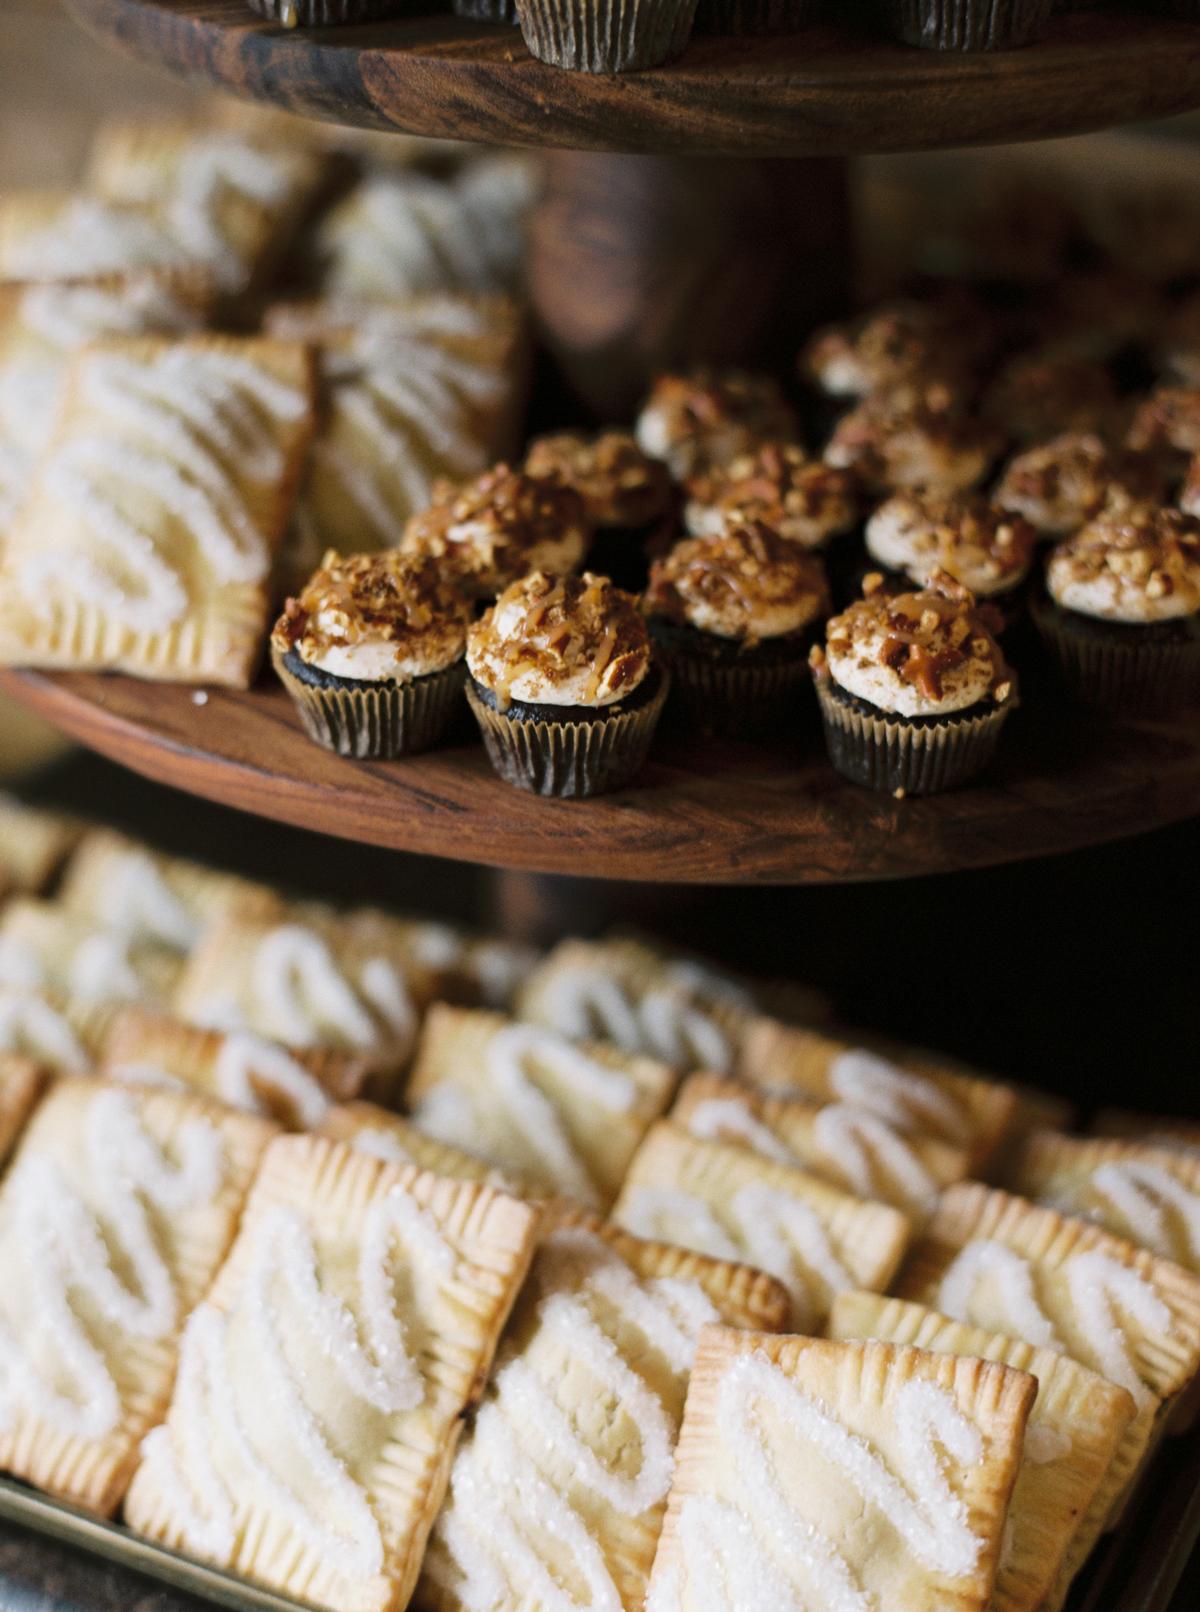 wedding desserts cupcakes and homemade pop tarts